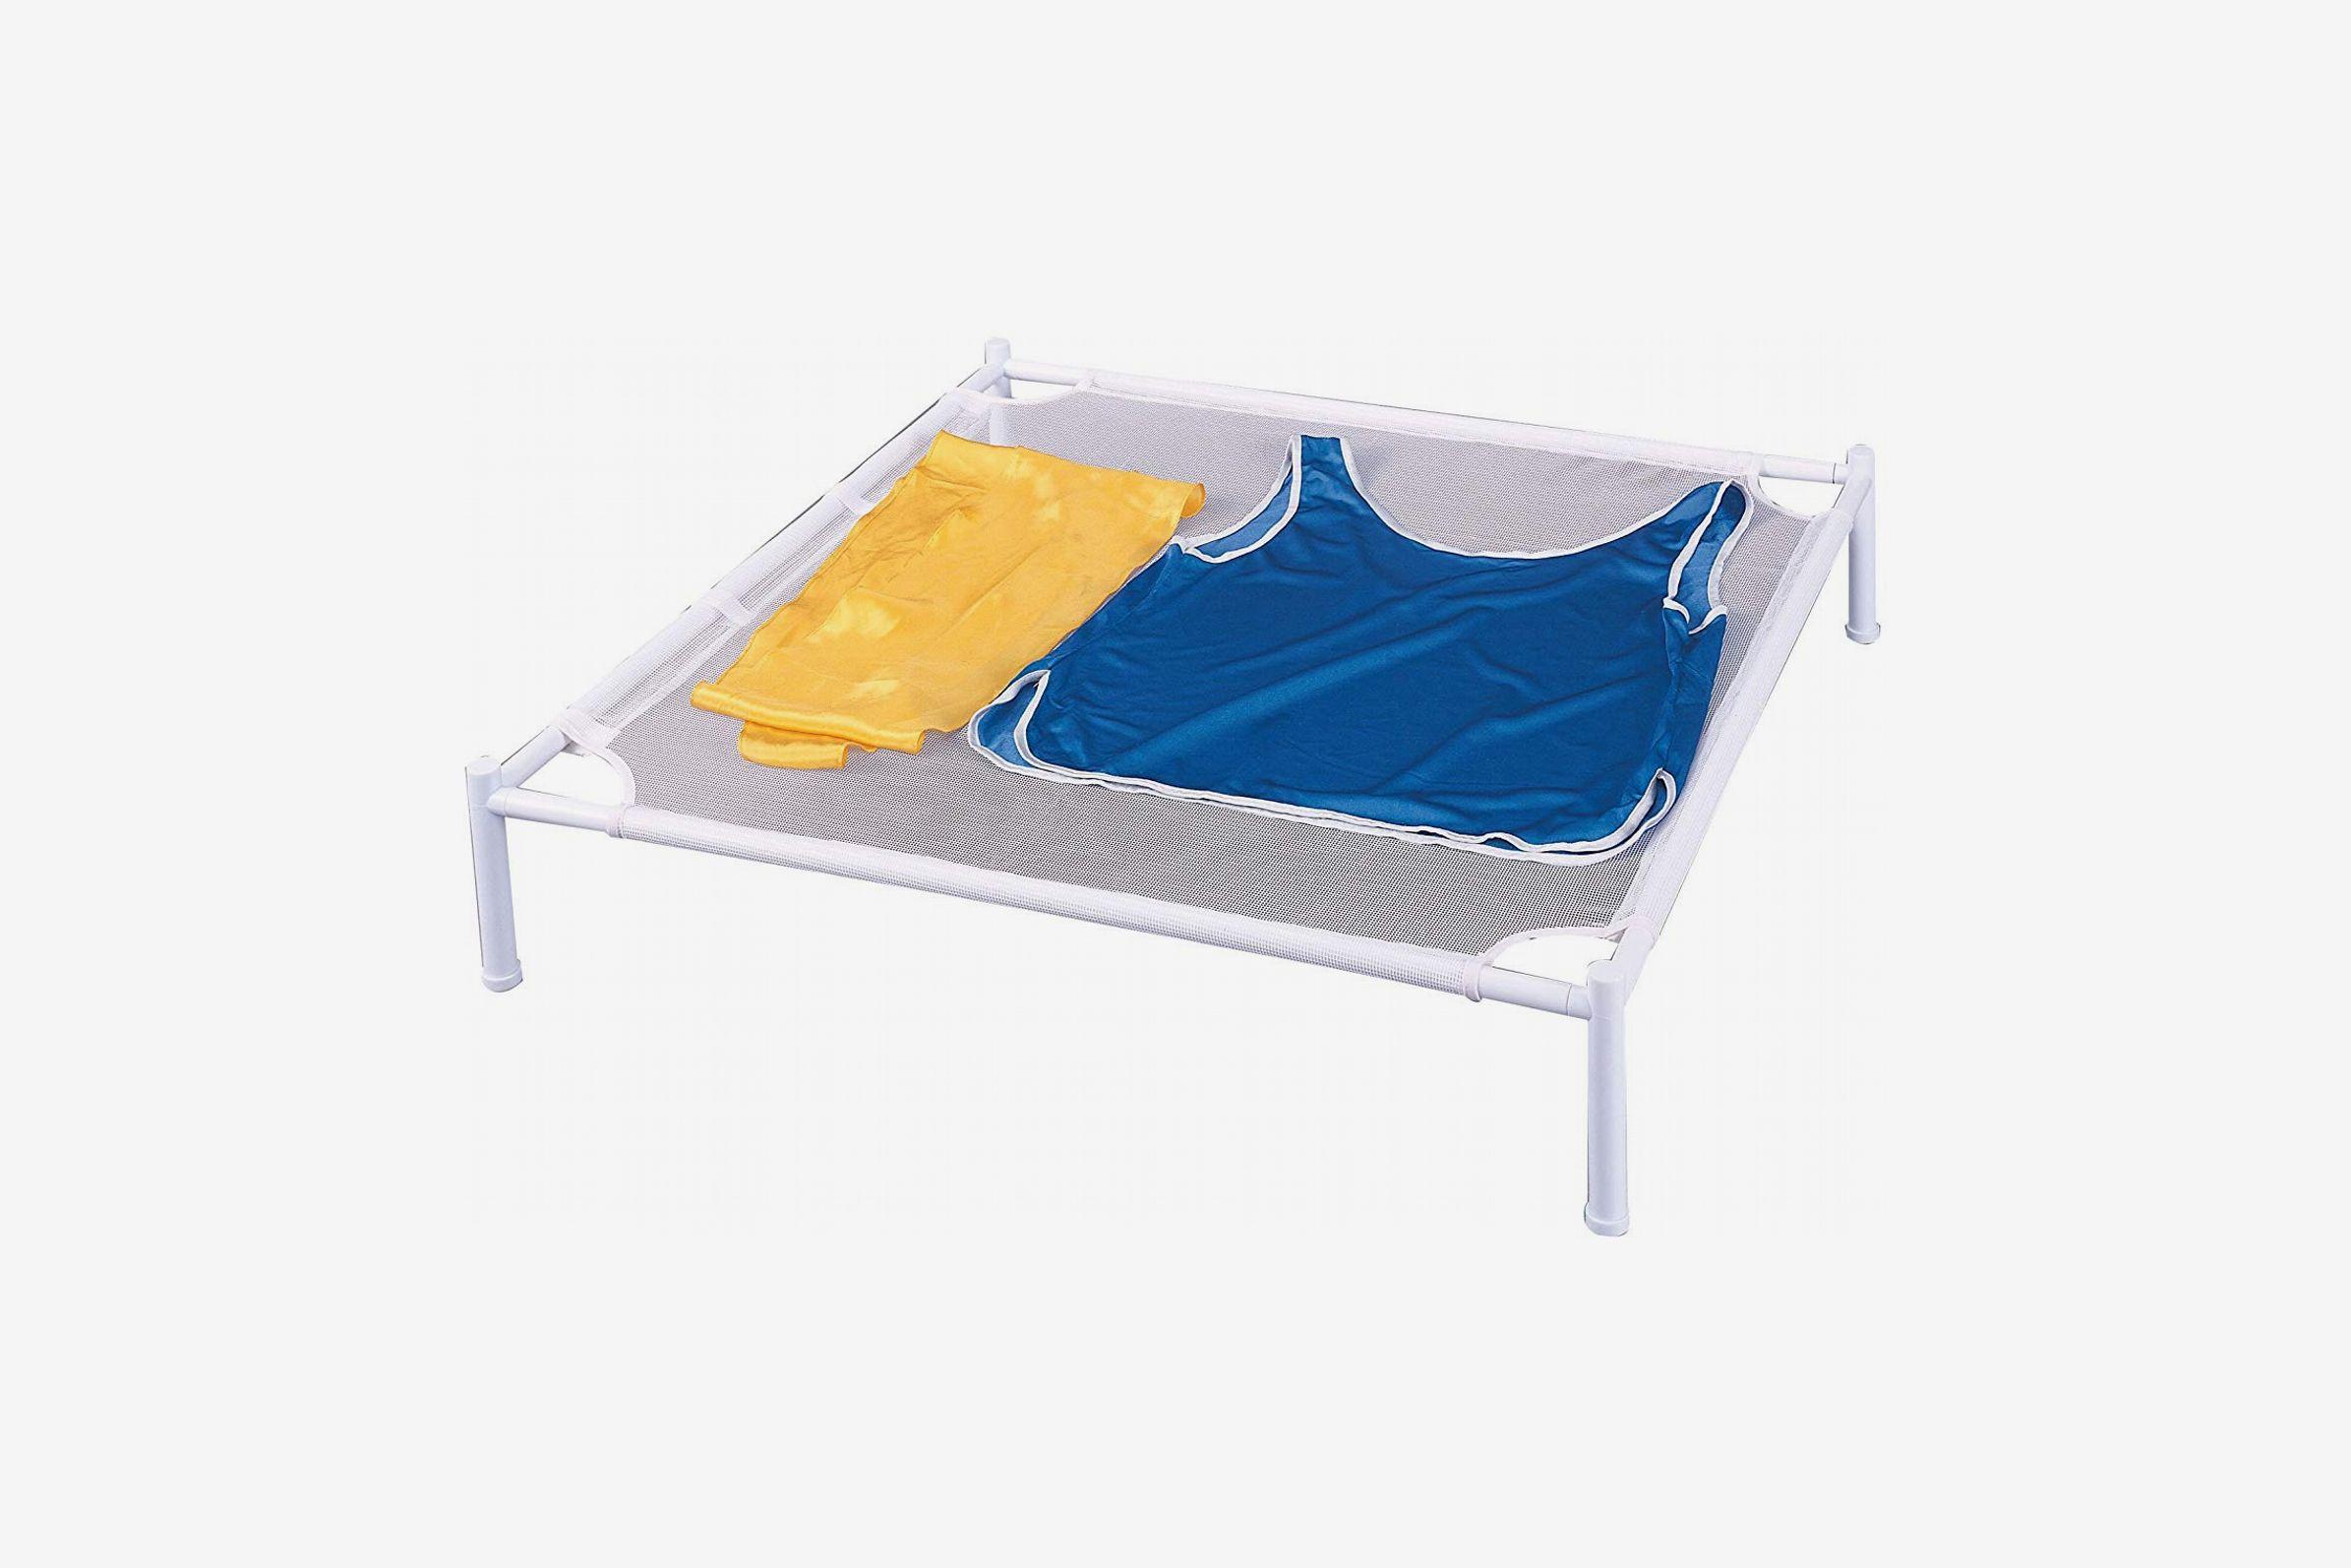 Household Essentials Mesh Drying Rack